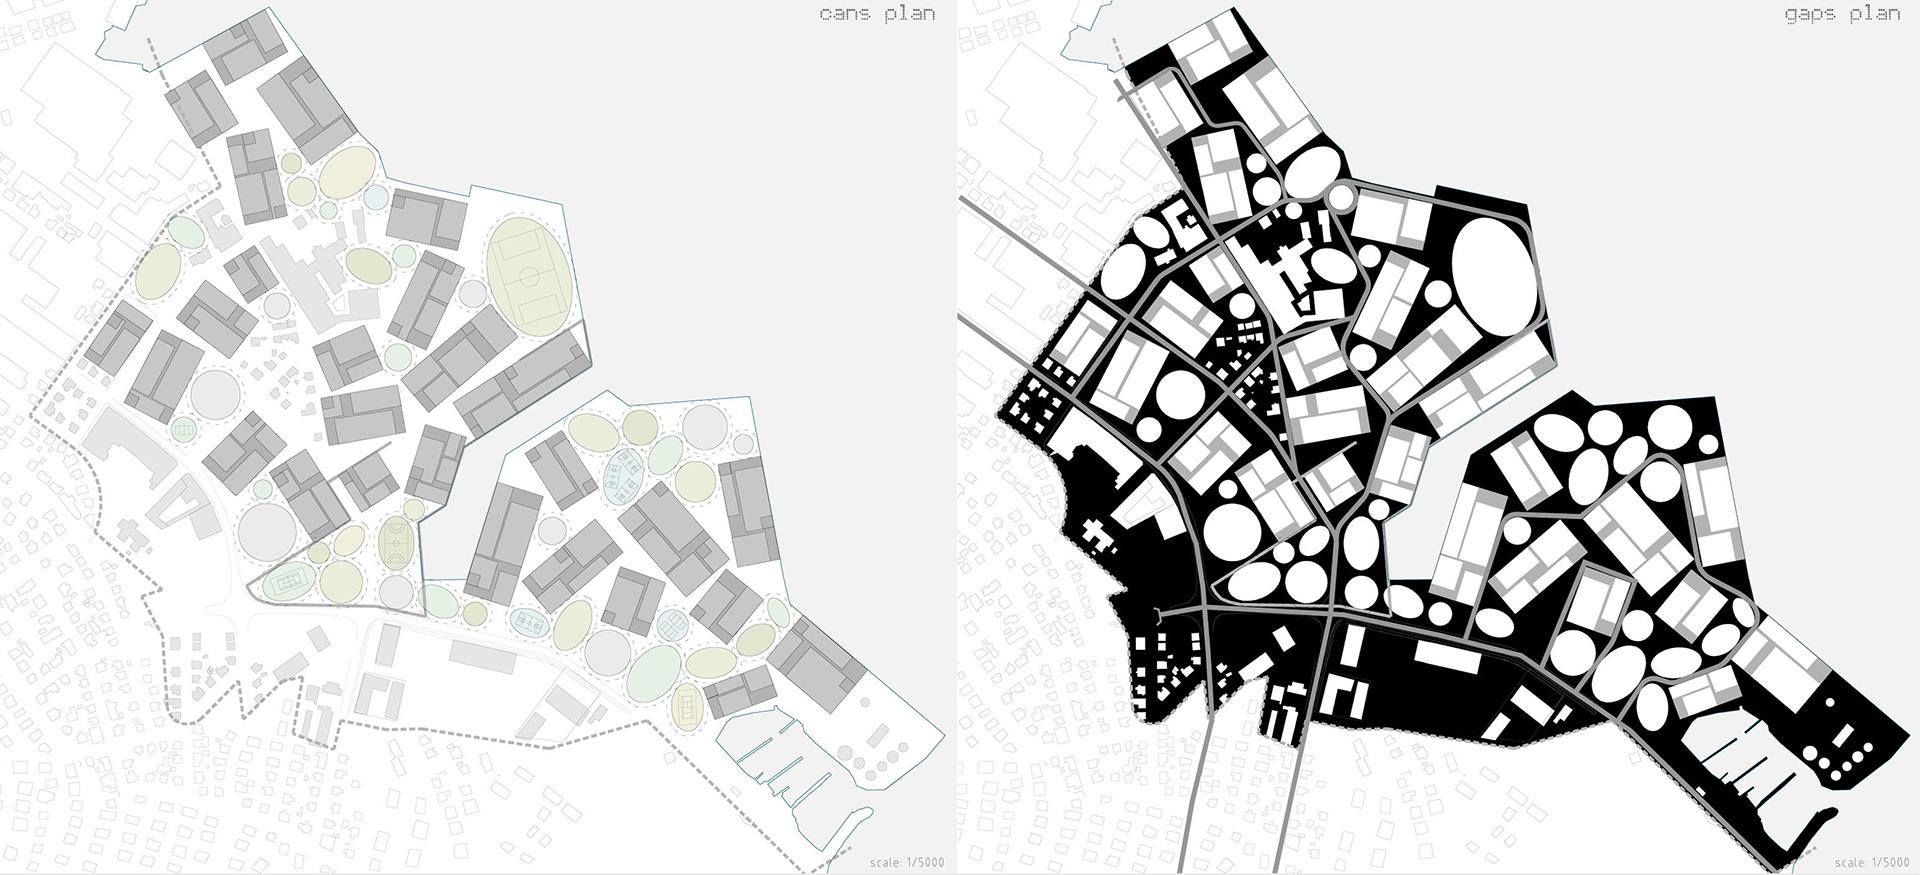 03_PLAYstudio-stavanger-lervig-housing